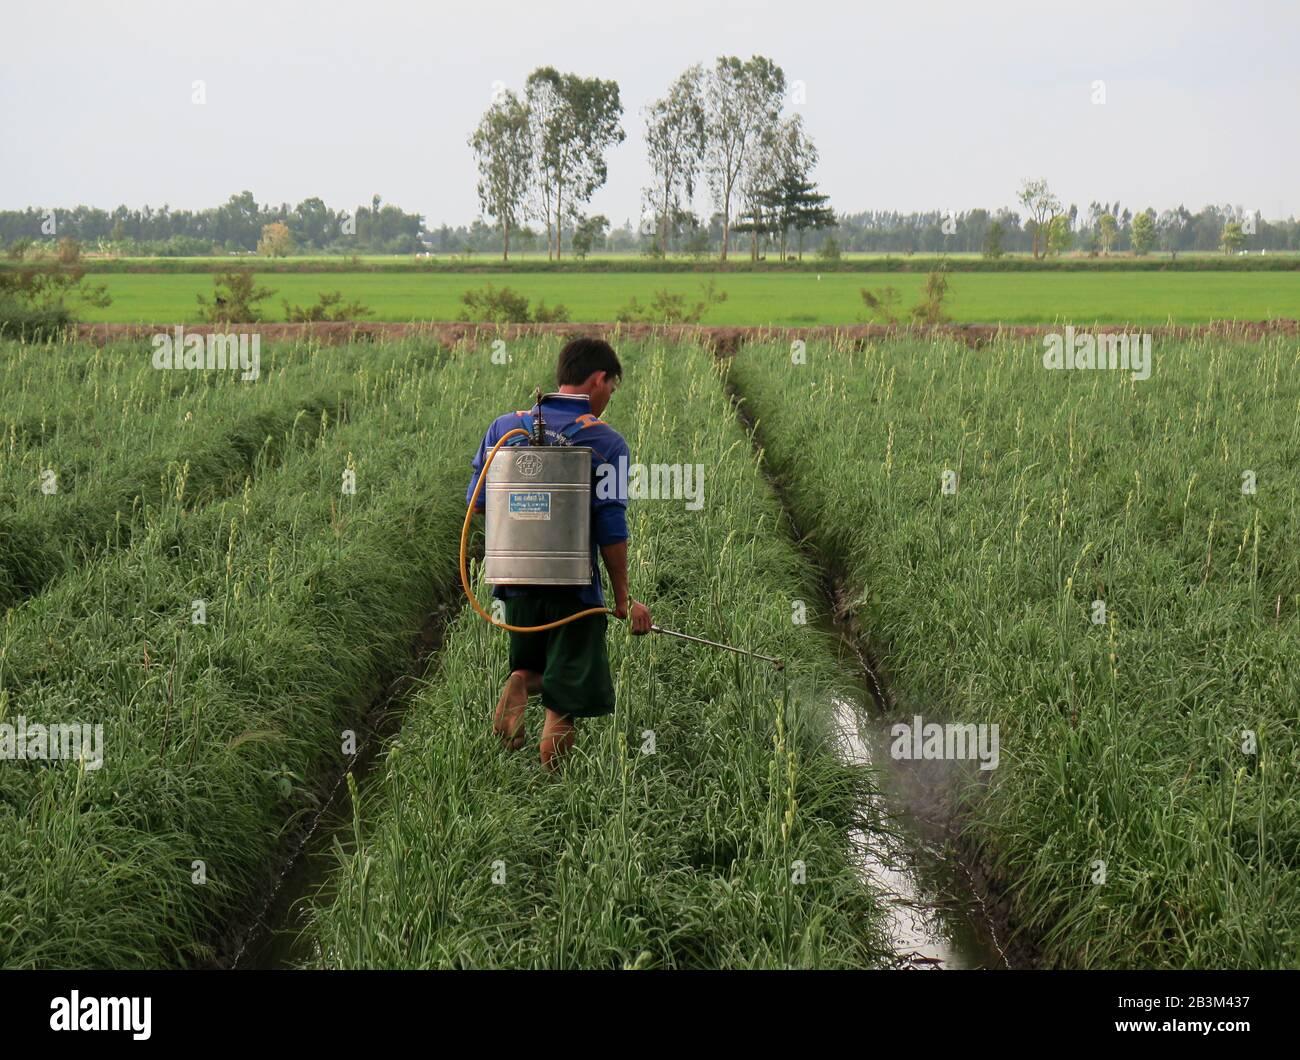 Spritzen, Unkrautvernichtung, Blumenbeet, Mekongdelta, Vietnam Stock Photo